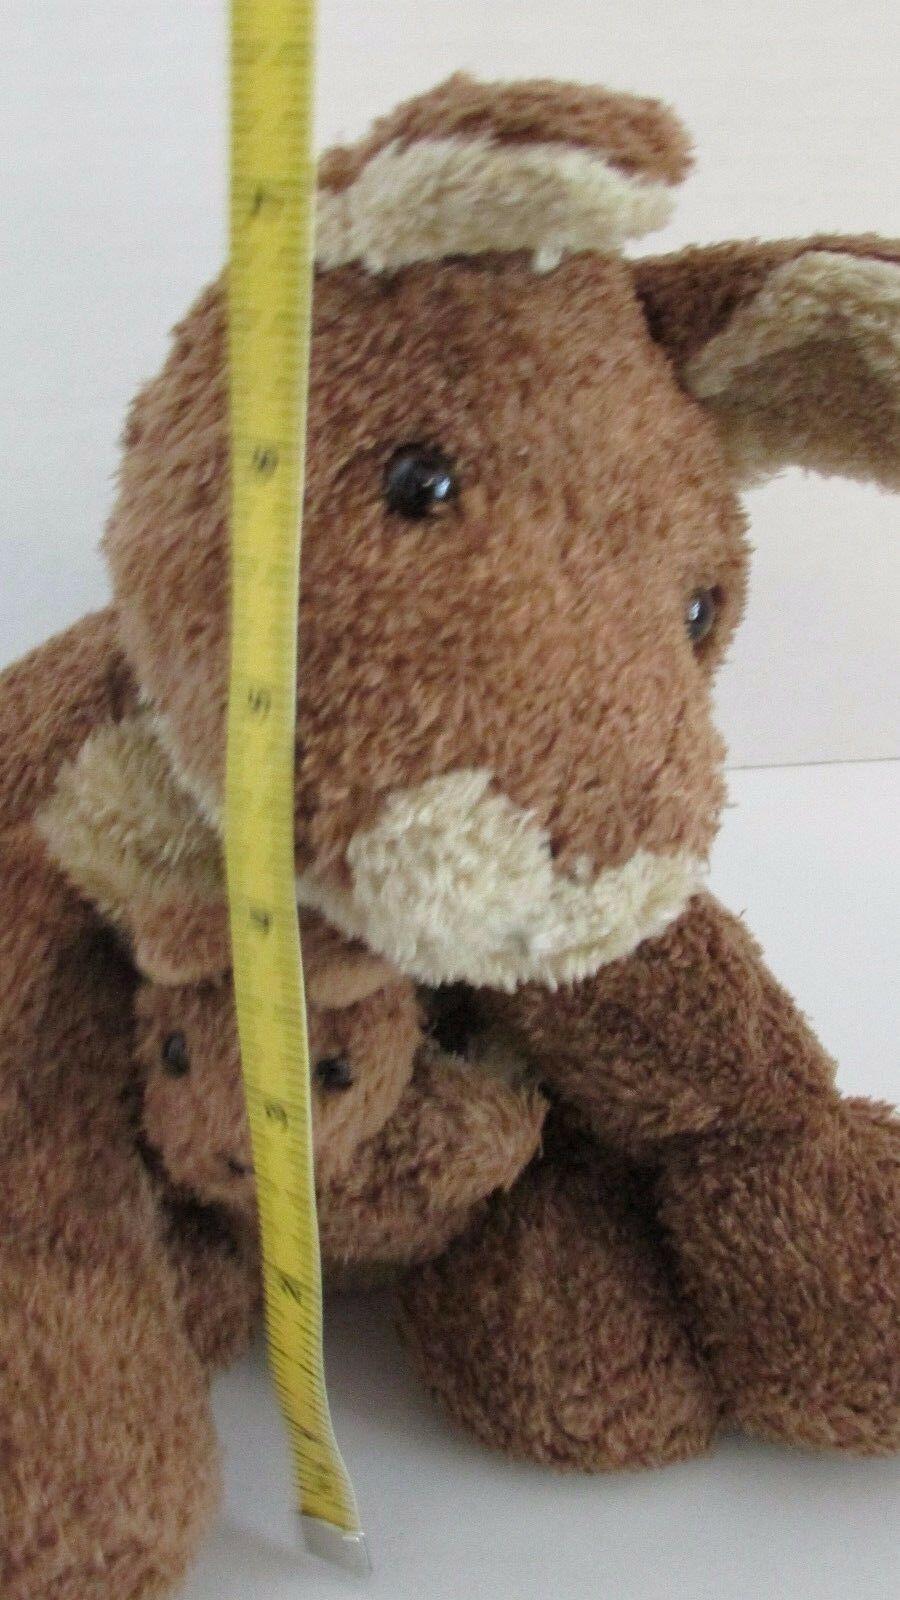 Brown cream tan Kangaroo mom baby joey beanbag plush soft floppy no tags image 9